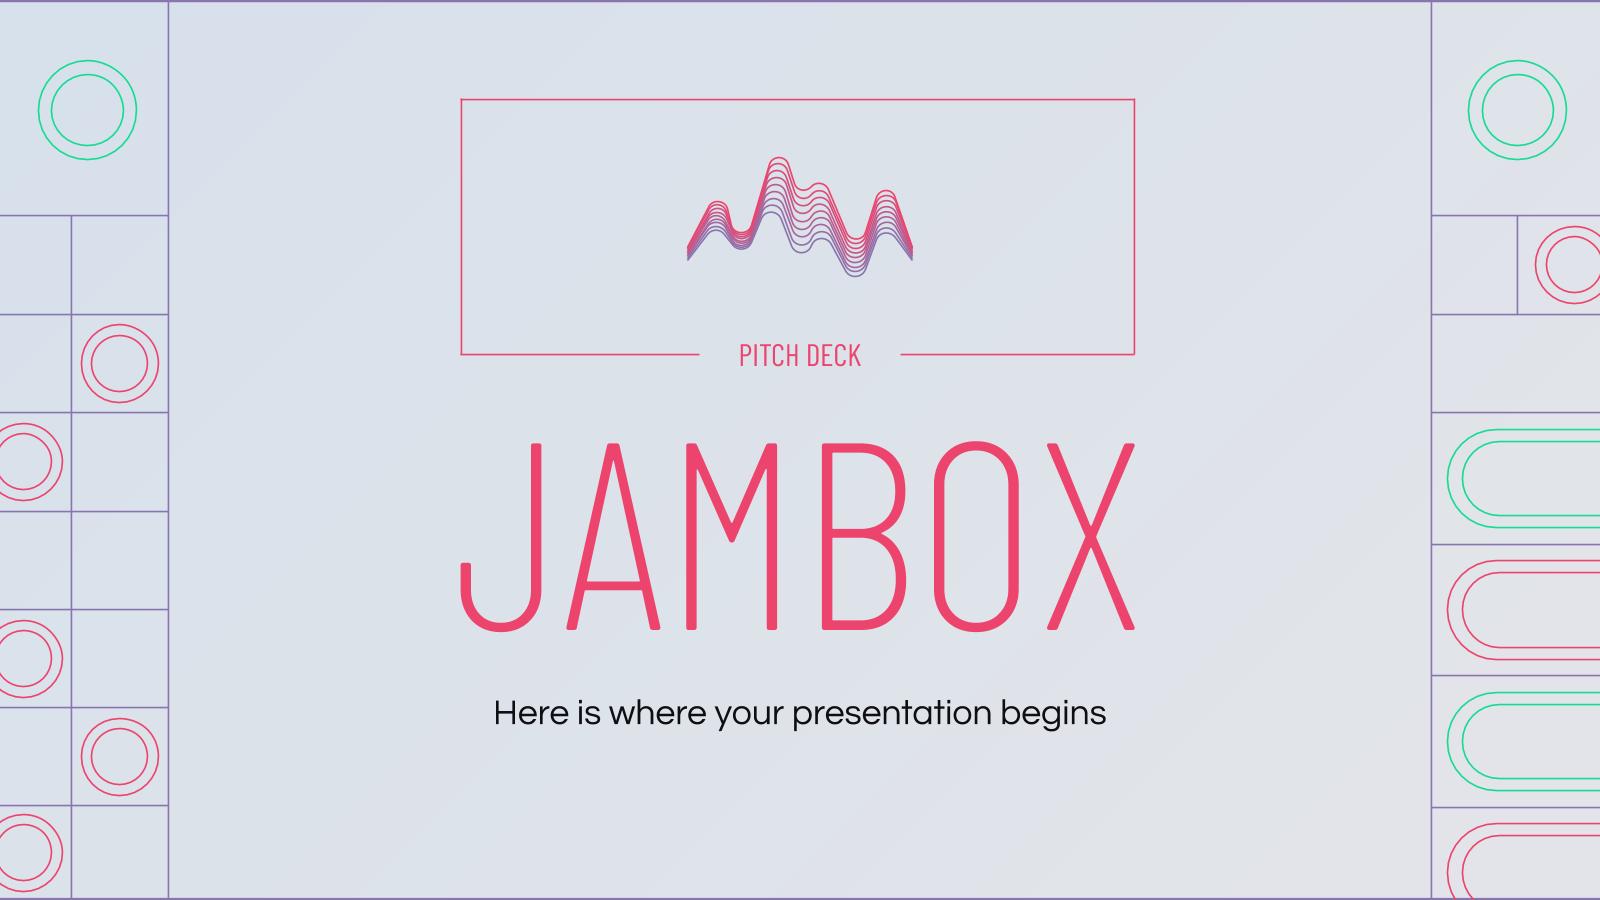 Jambox Pitch Deck presentation template